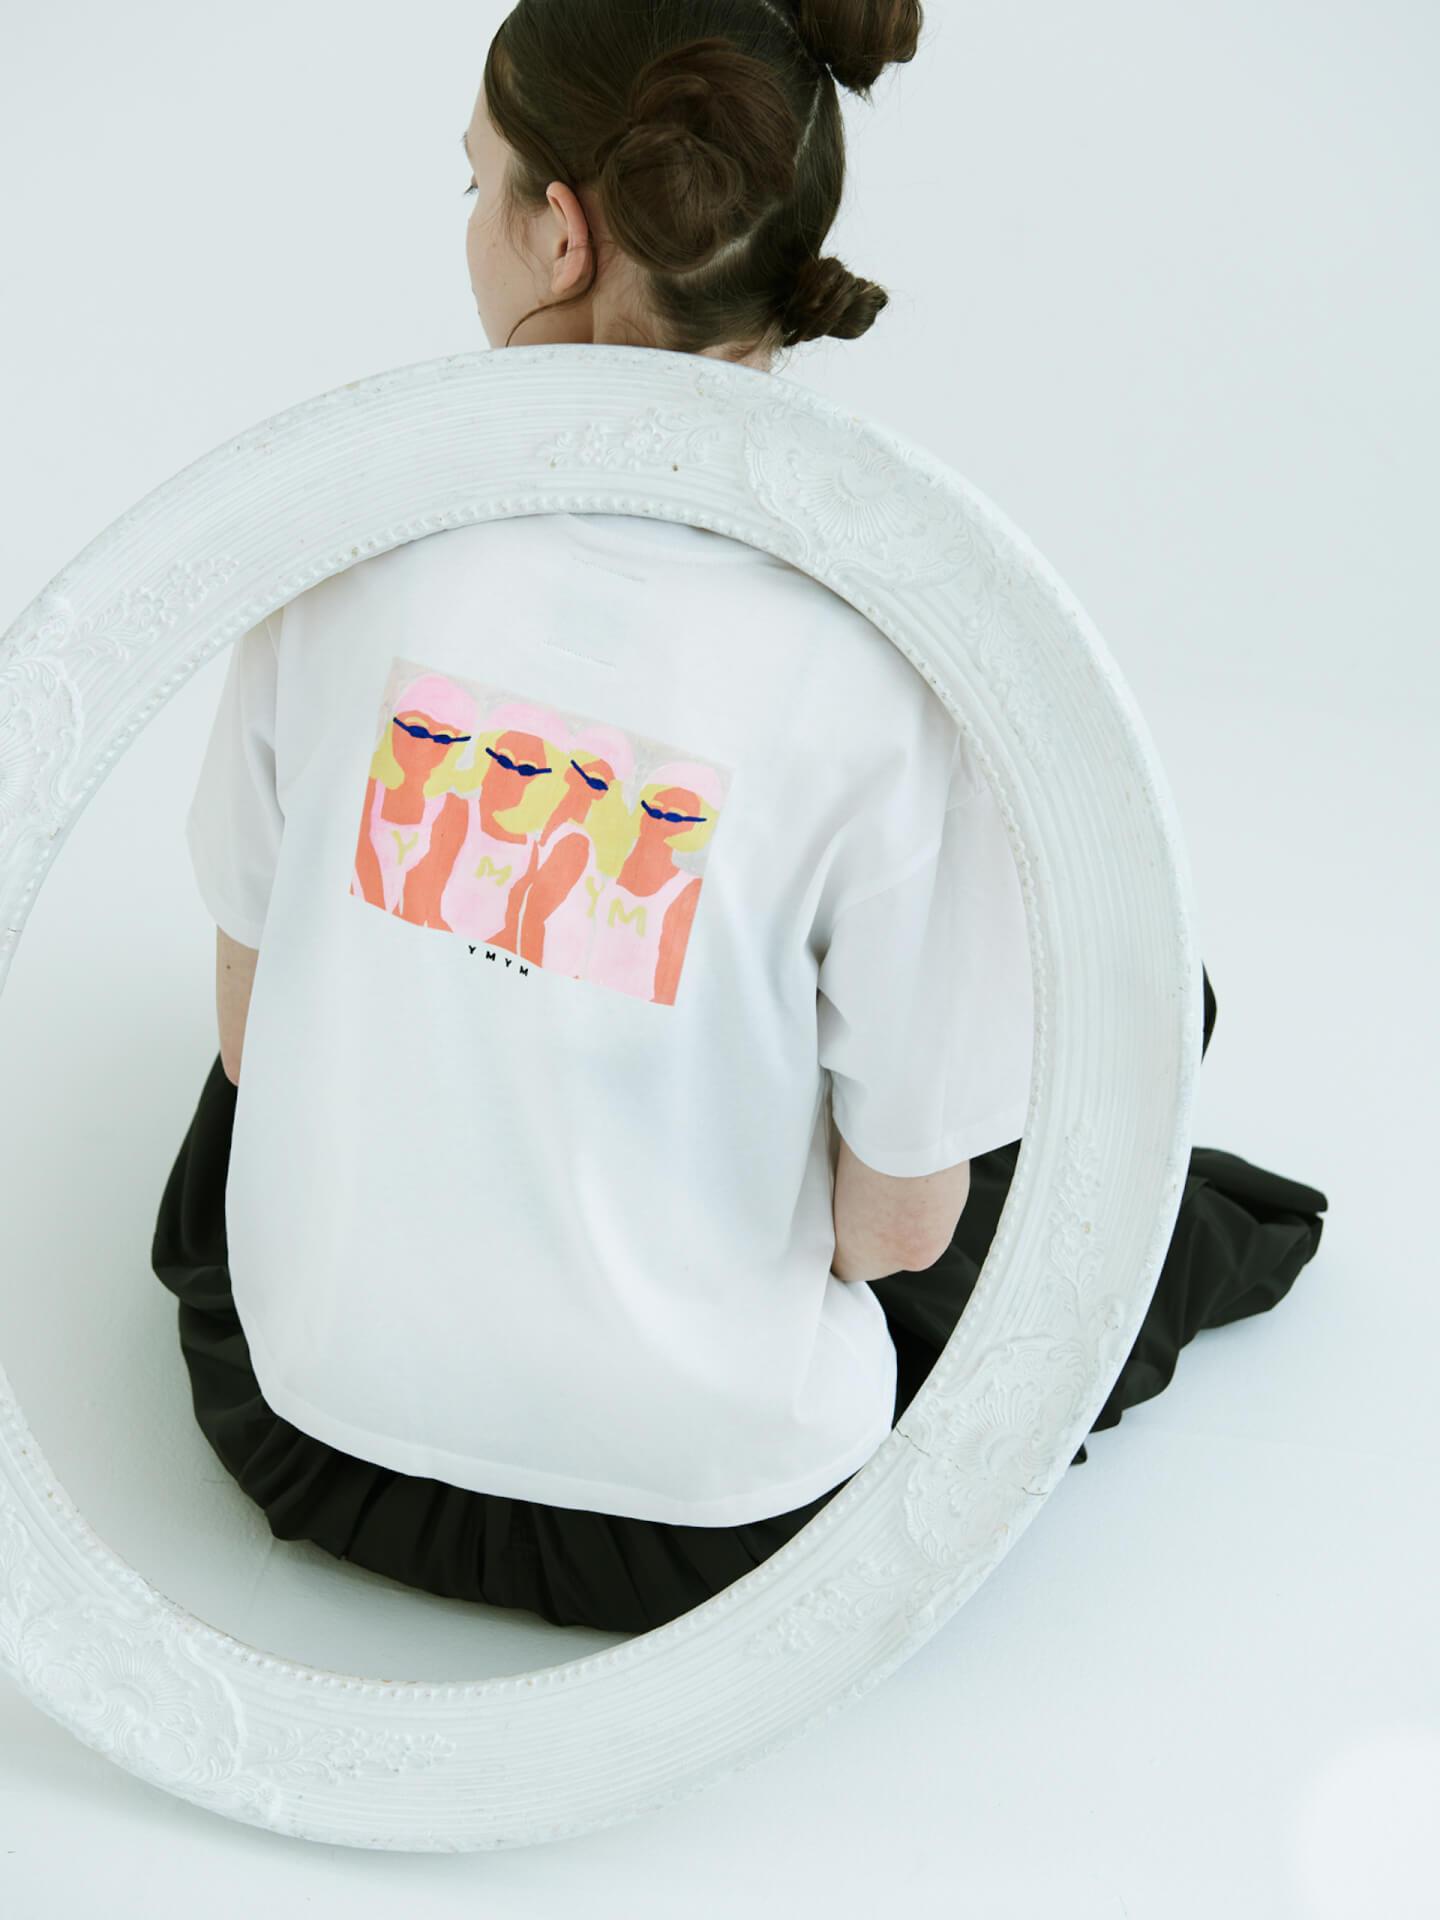 CHAIのベーシスト・YUUKIによるプロジェクト「YMYM」よりファッションブランドオープン!2021年春夏コレクション&描き下ろし絵画などの展示会も life210405_ymym_10